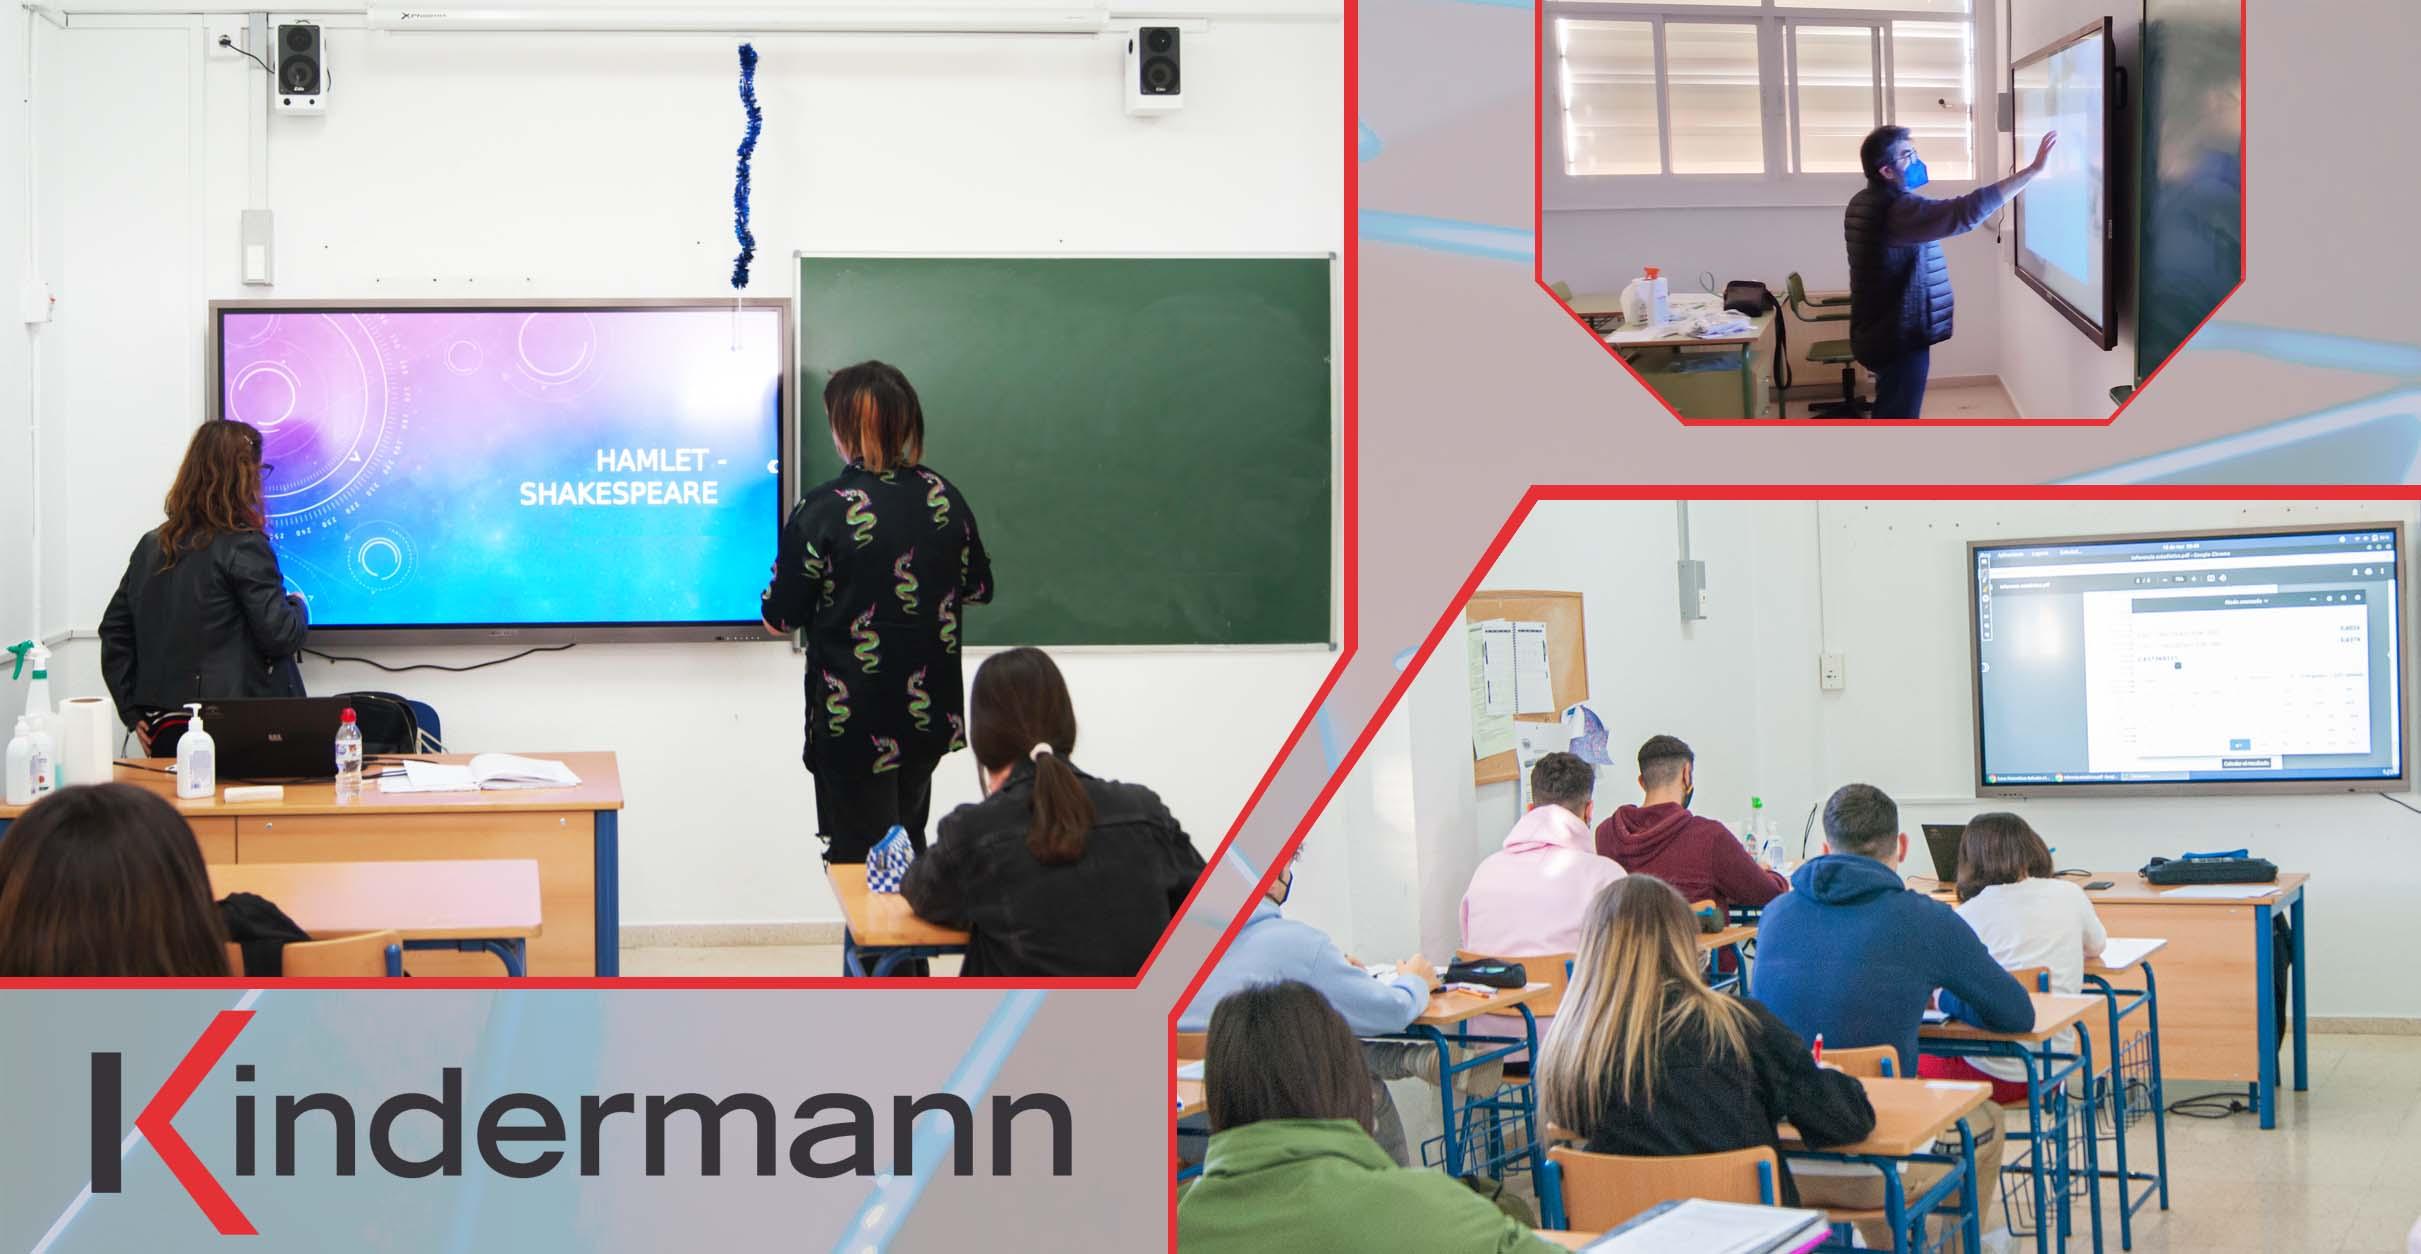 Monitor táctil Kindermann para los centros educativos